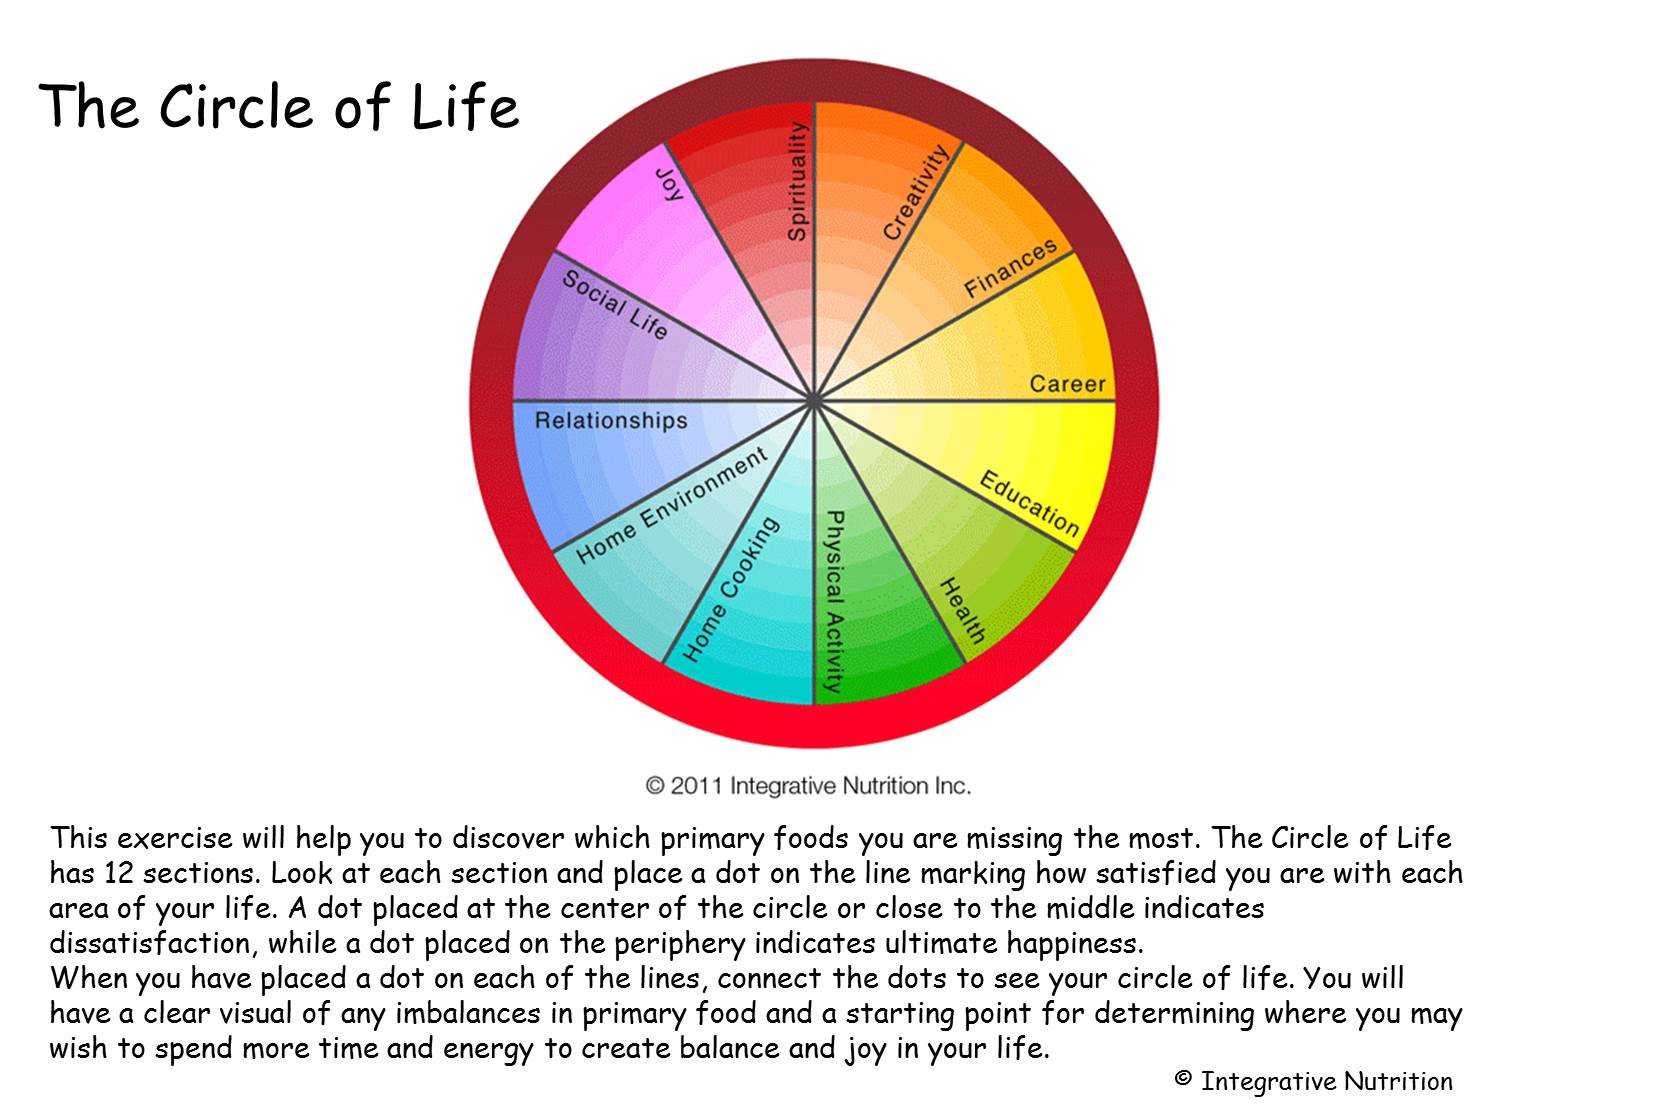 http://mannafoldblessings.com/wp-content/uploads/2015/08/Circle-of-Life.jpg